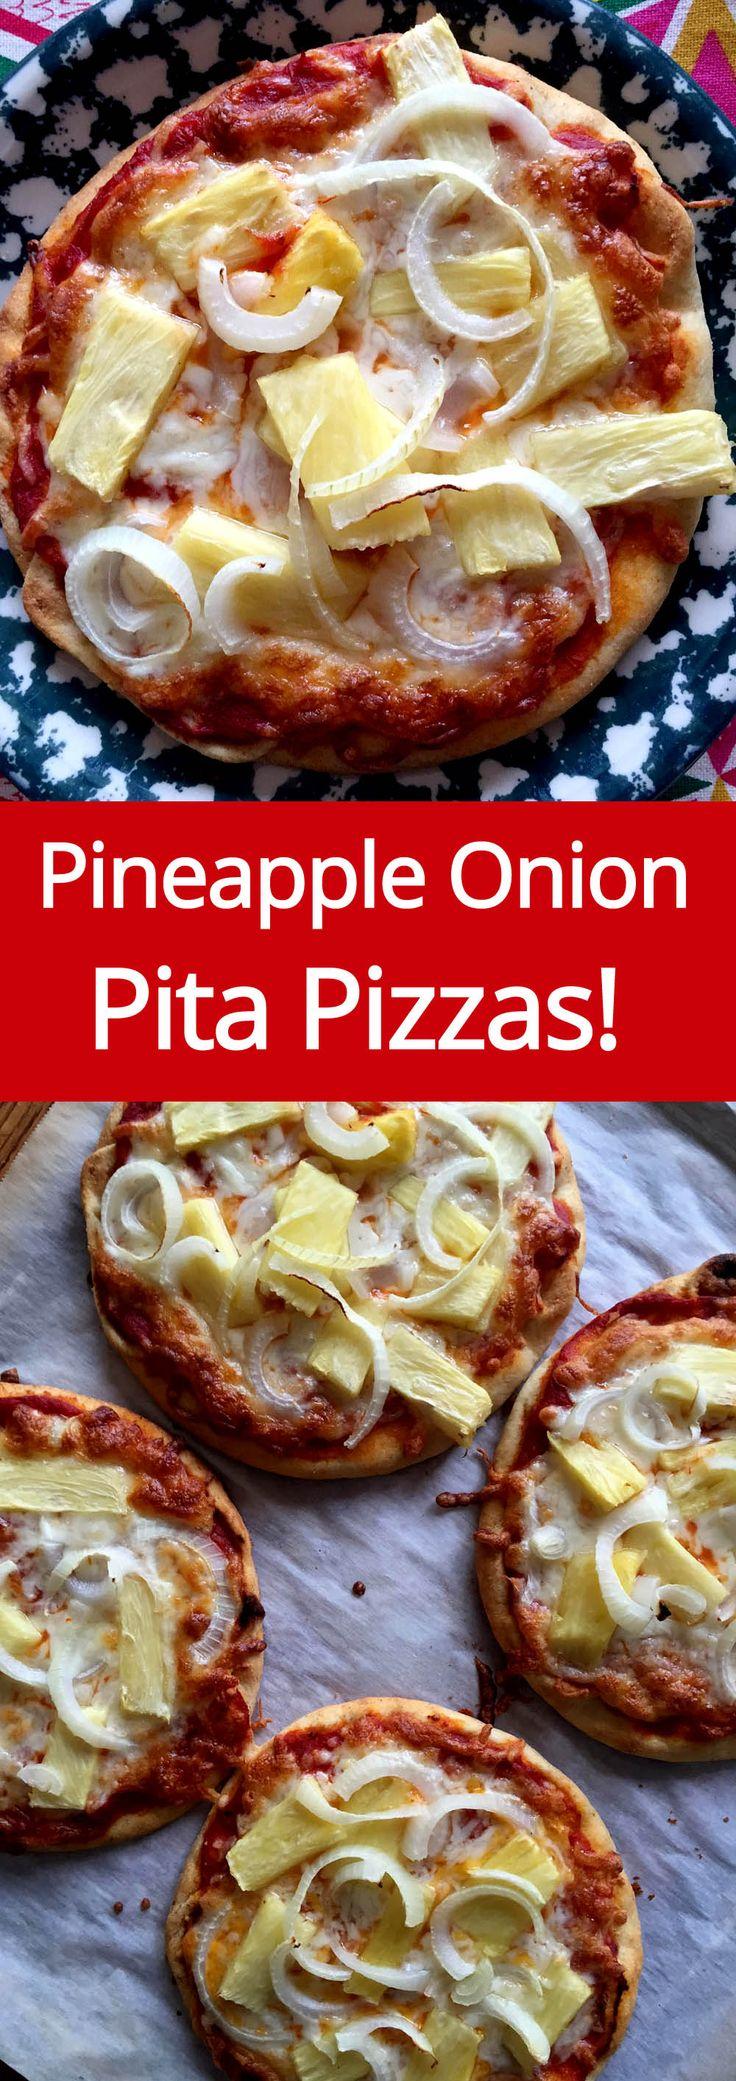 Pineapple Onion Pita Pizza Recipe - super easy way to make individual pizzas! (from MelanieCooks.com)